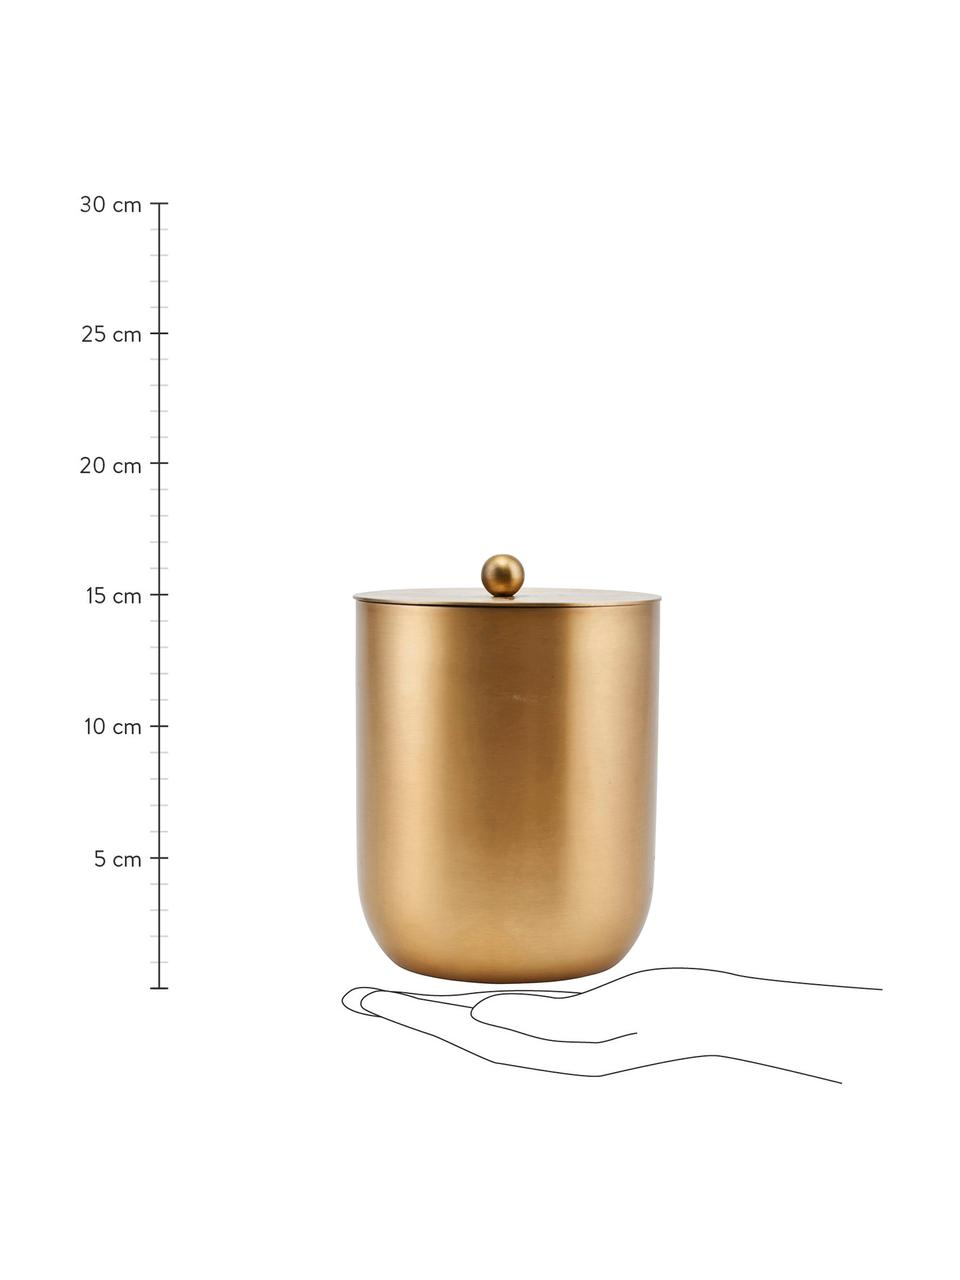 Kleiner Eiseimer Alir in Gold, Edelstahl, Messing, Messingfarben, Ø 12 x 15 cm